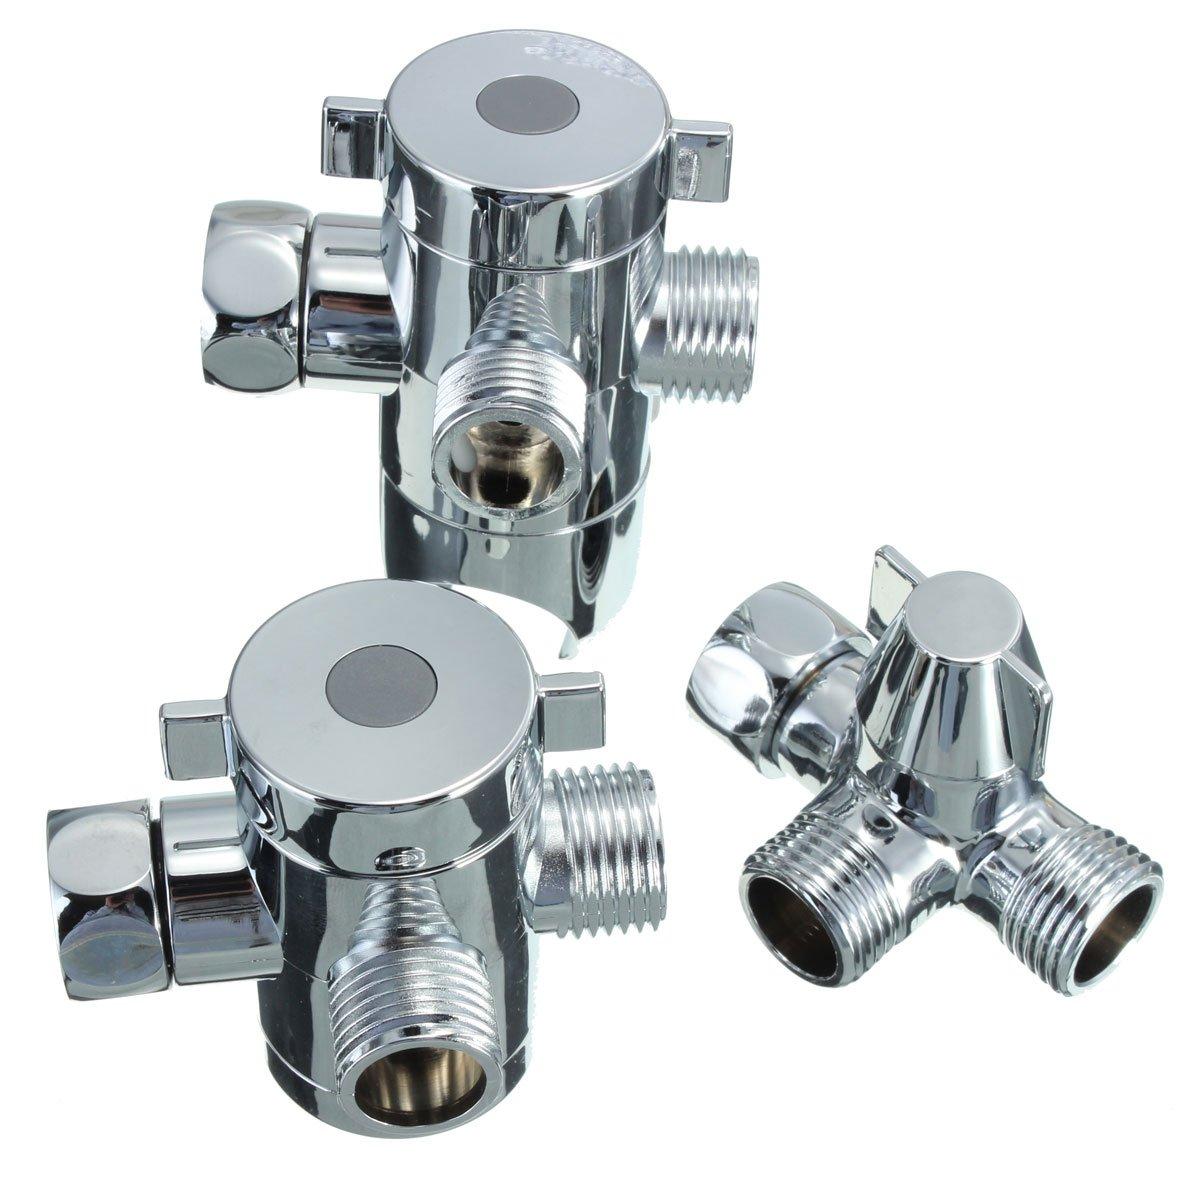 Ungfu Mall G1/2 Inch Three Way T-adapter Shower Head Diverter Valve ...